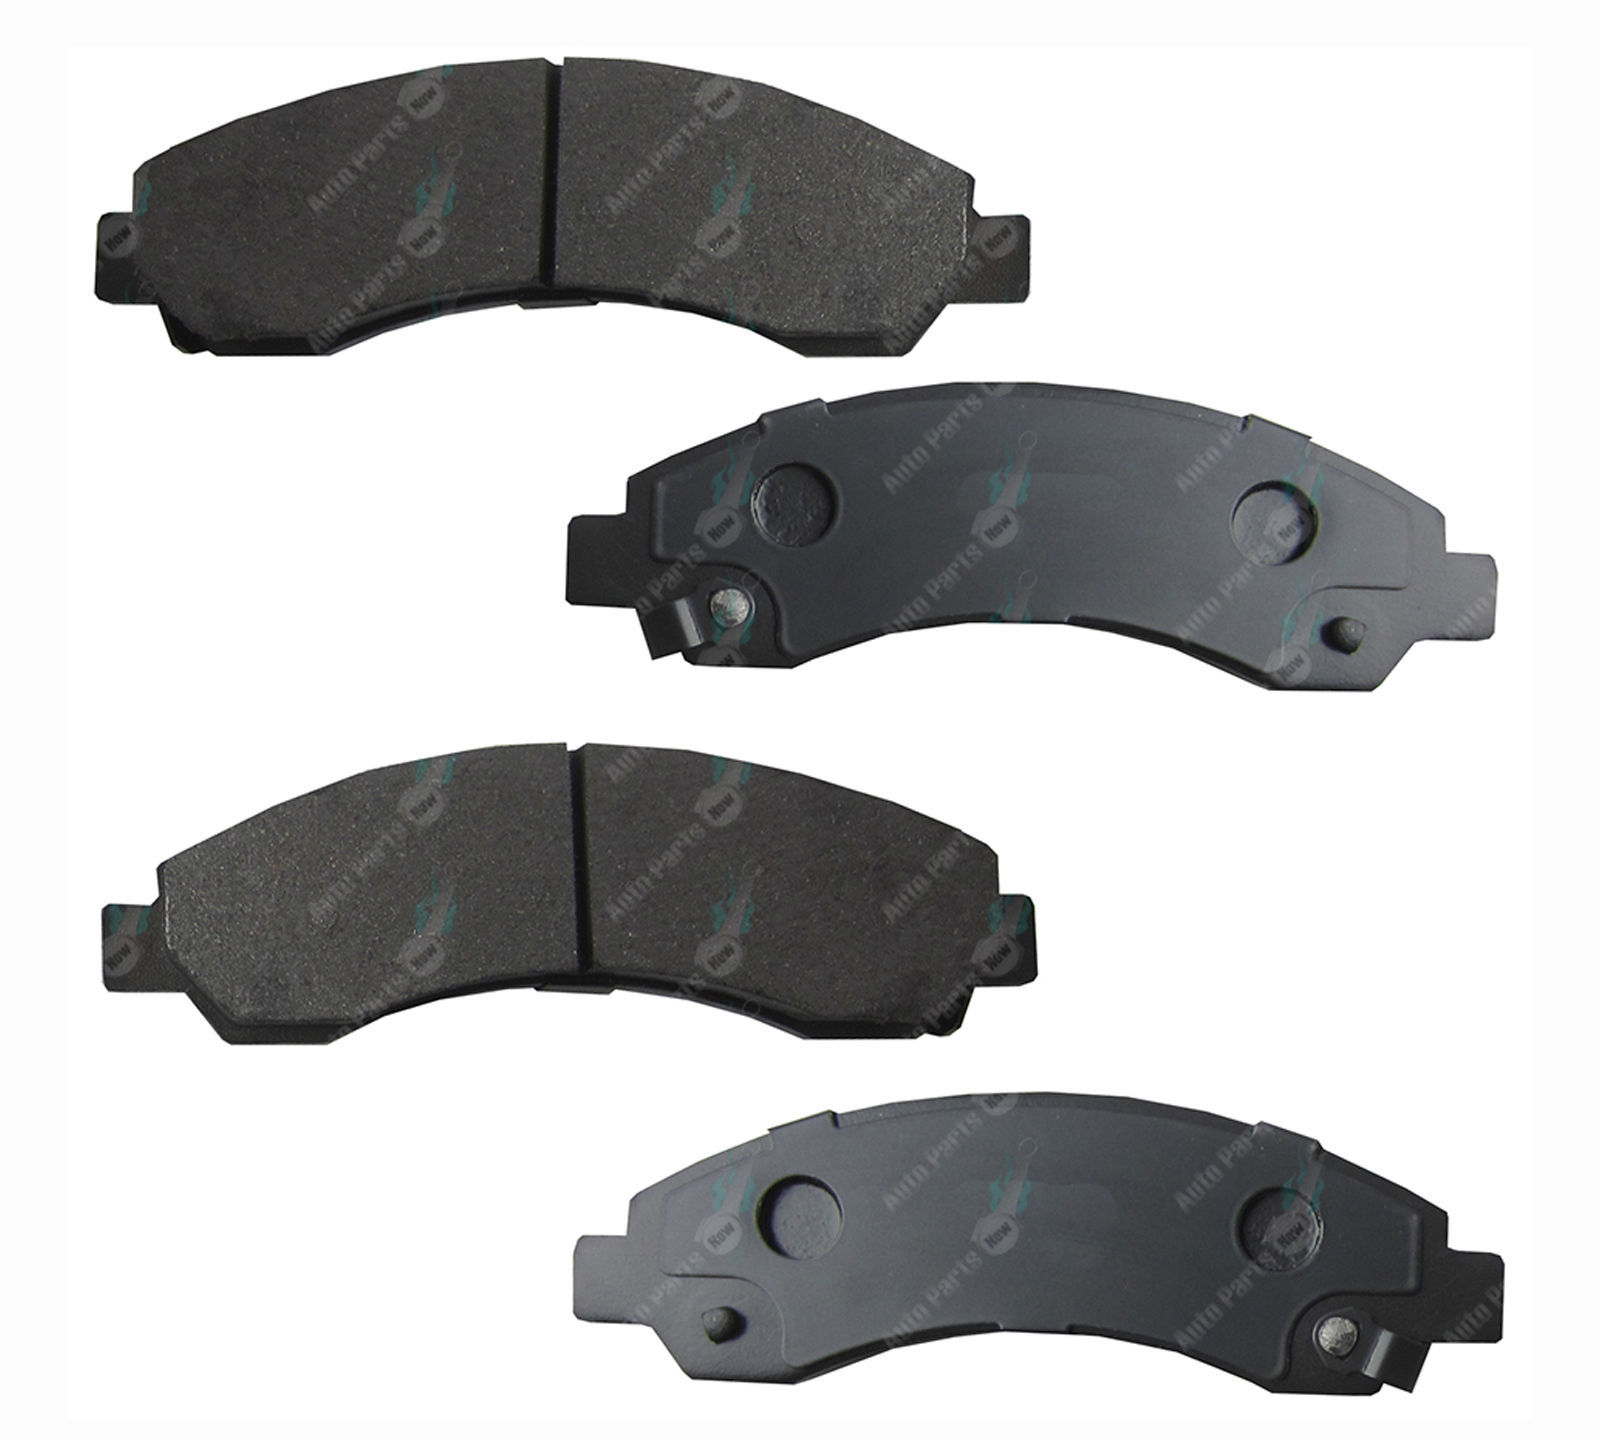 2 Front Disc Brake Rotors Great Wall V200 V240 X200 X240 K2 CC 2009-2014 RWD 4X4